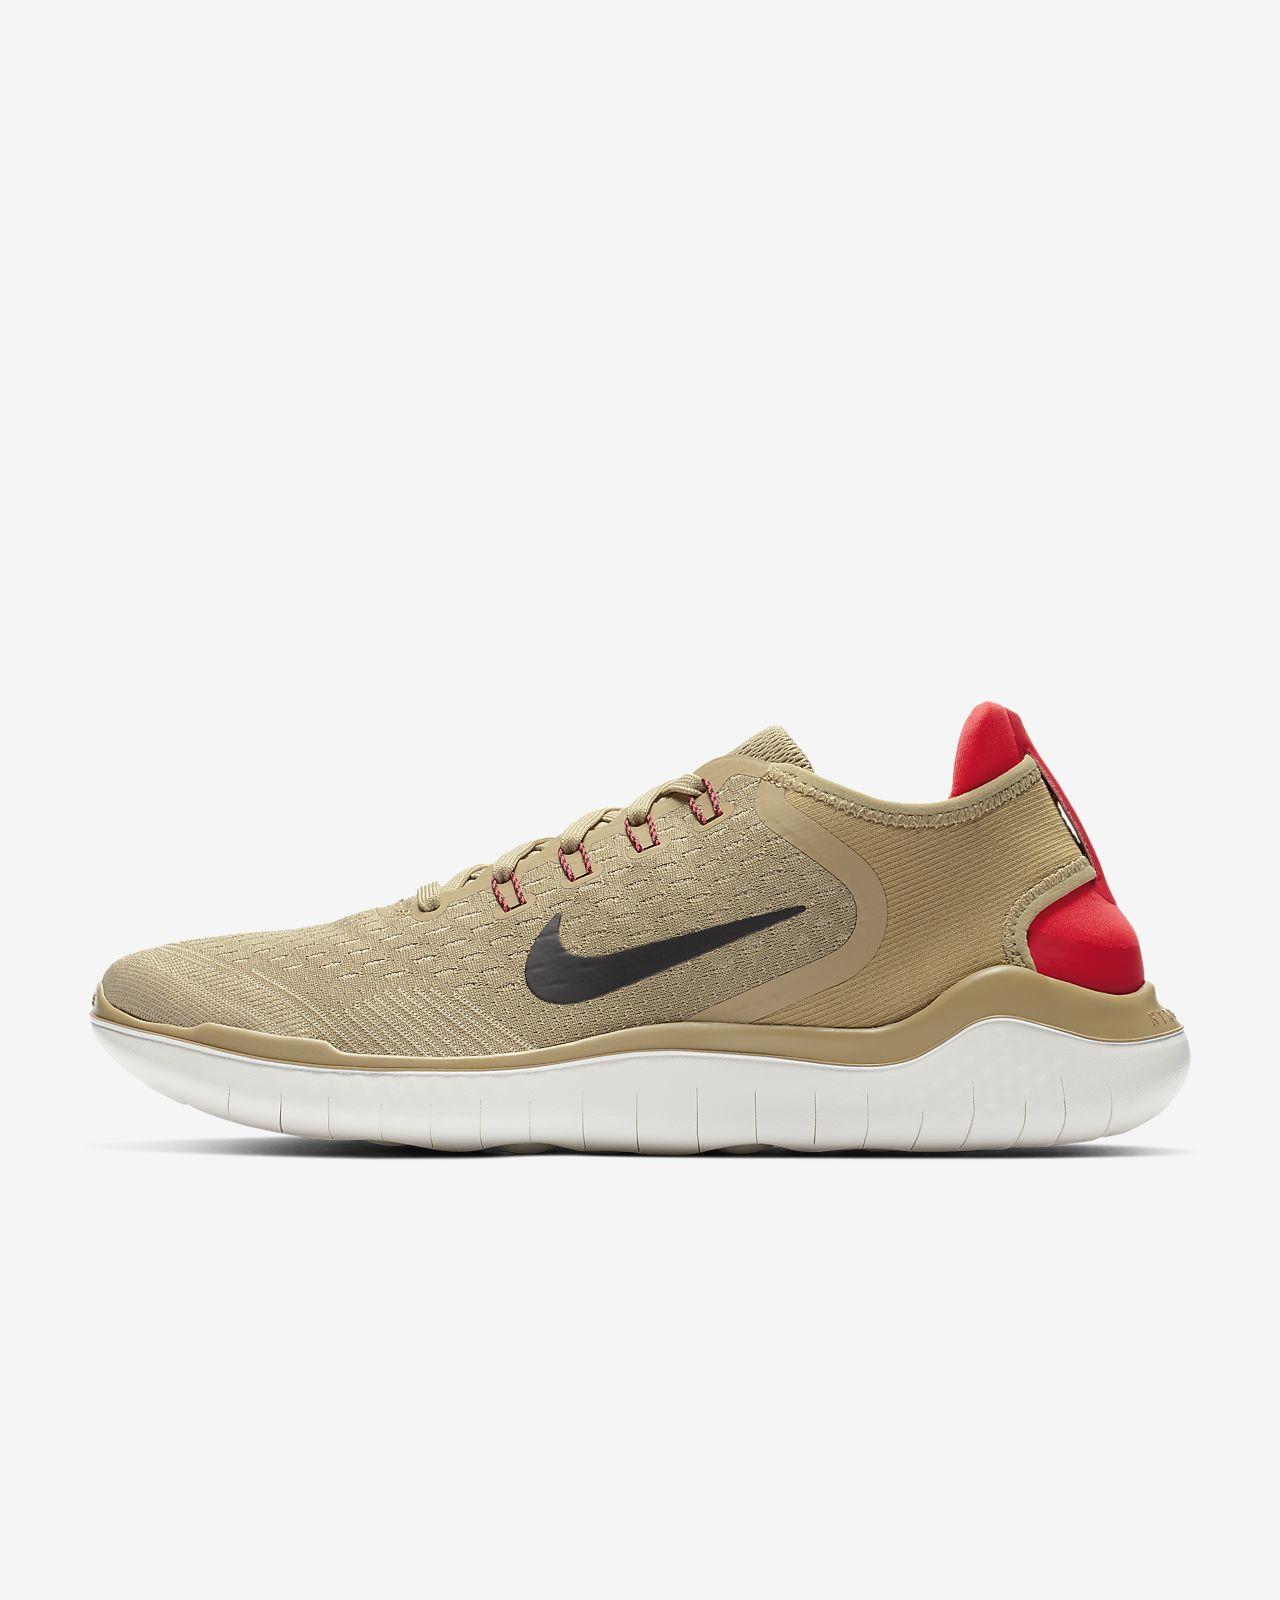 0b6618e350ae Nike Free RN 2018 Men s Running Shoe. Nike.com